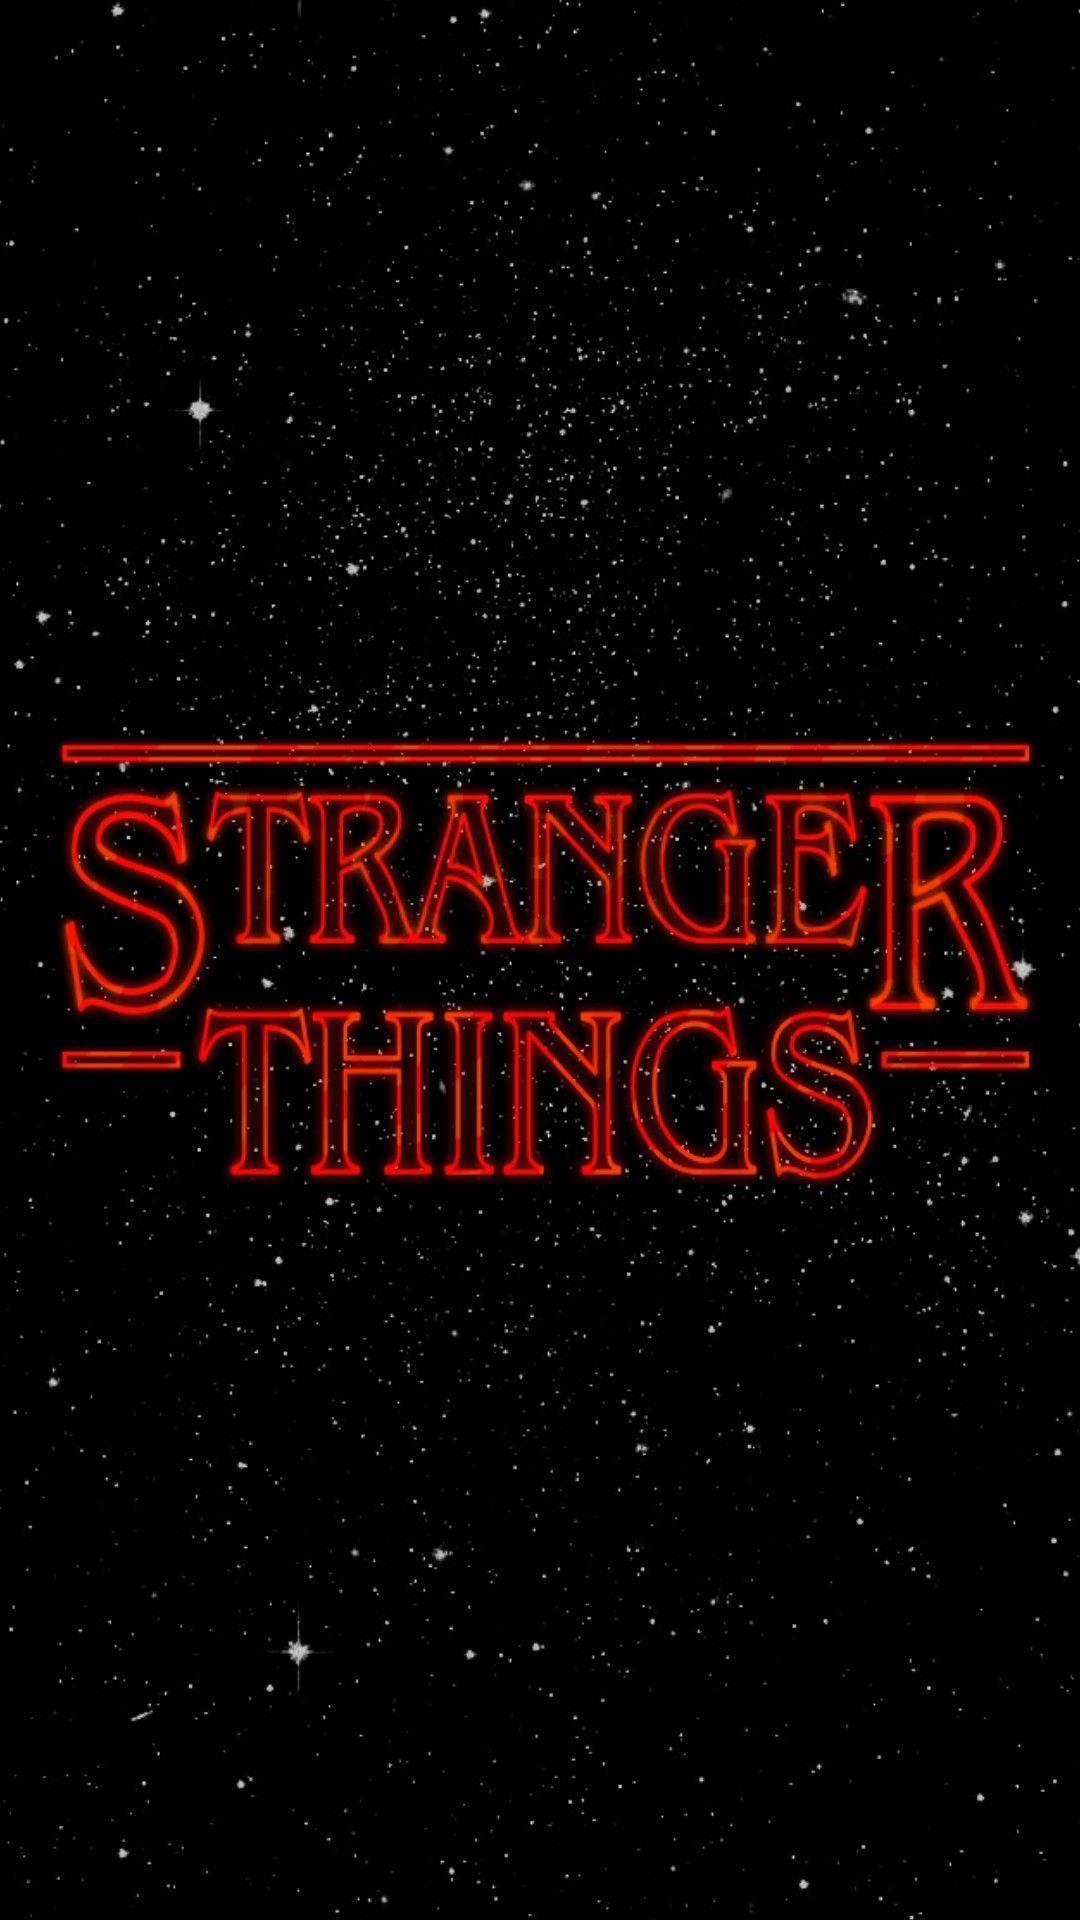 Stranger Things Nerd Wallpaper Stars Full Hd 4k 4k Sfondi Per Telefono Sfondi Iphone Sfondi Carini